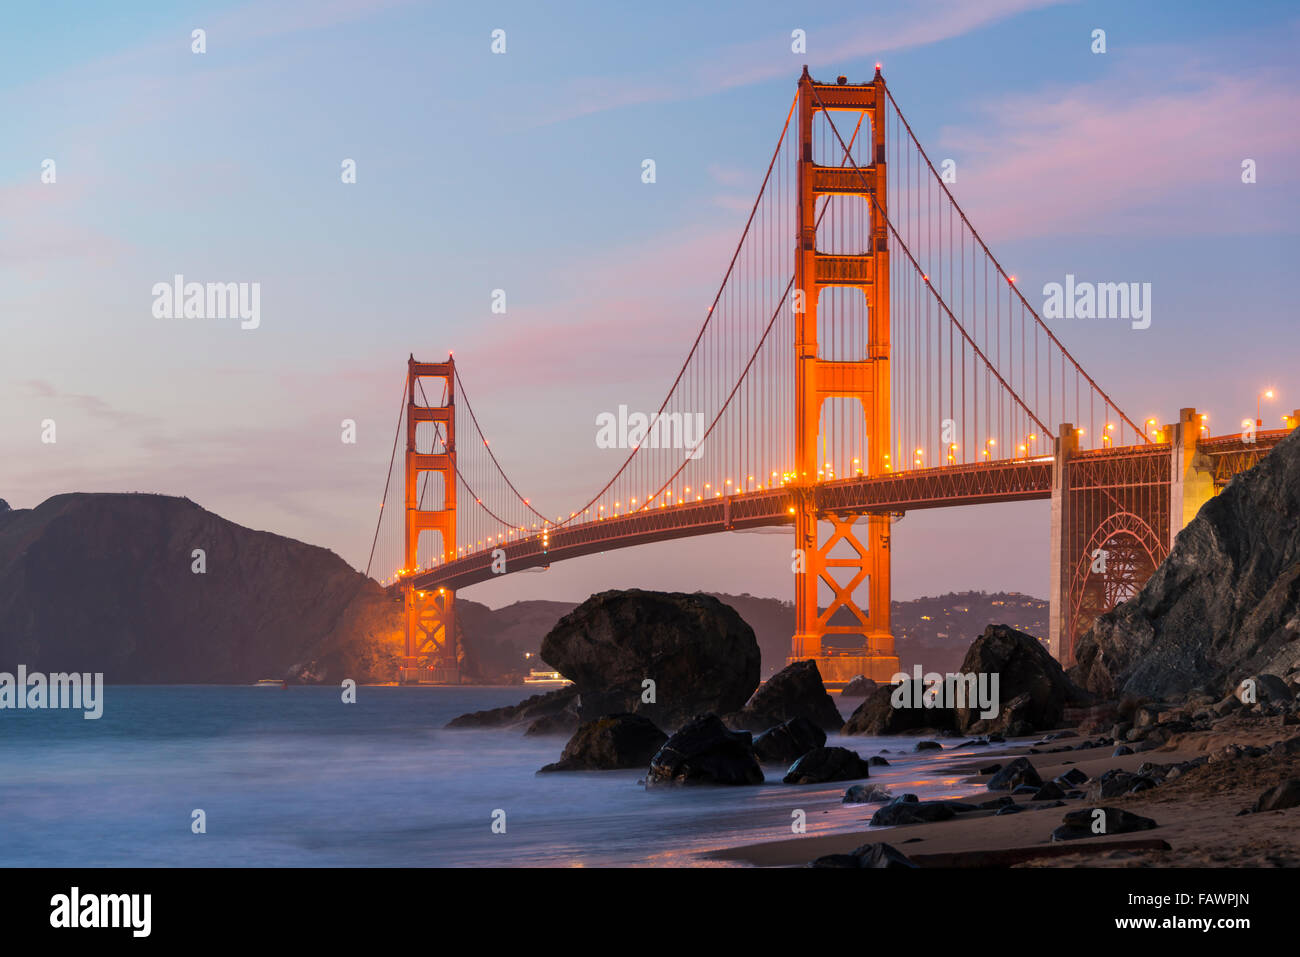 Puente Golden Gate, Marshall's beach, noche, costa rocosa, San Francisco, EE.UU. Imagen De Stock